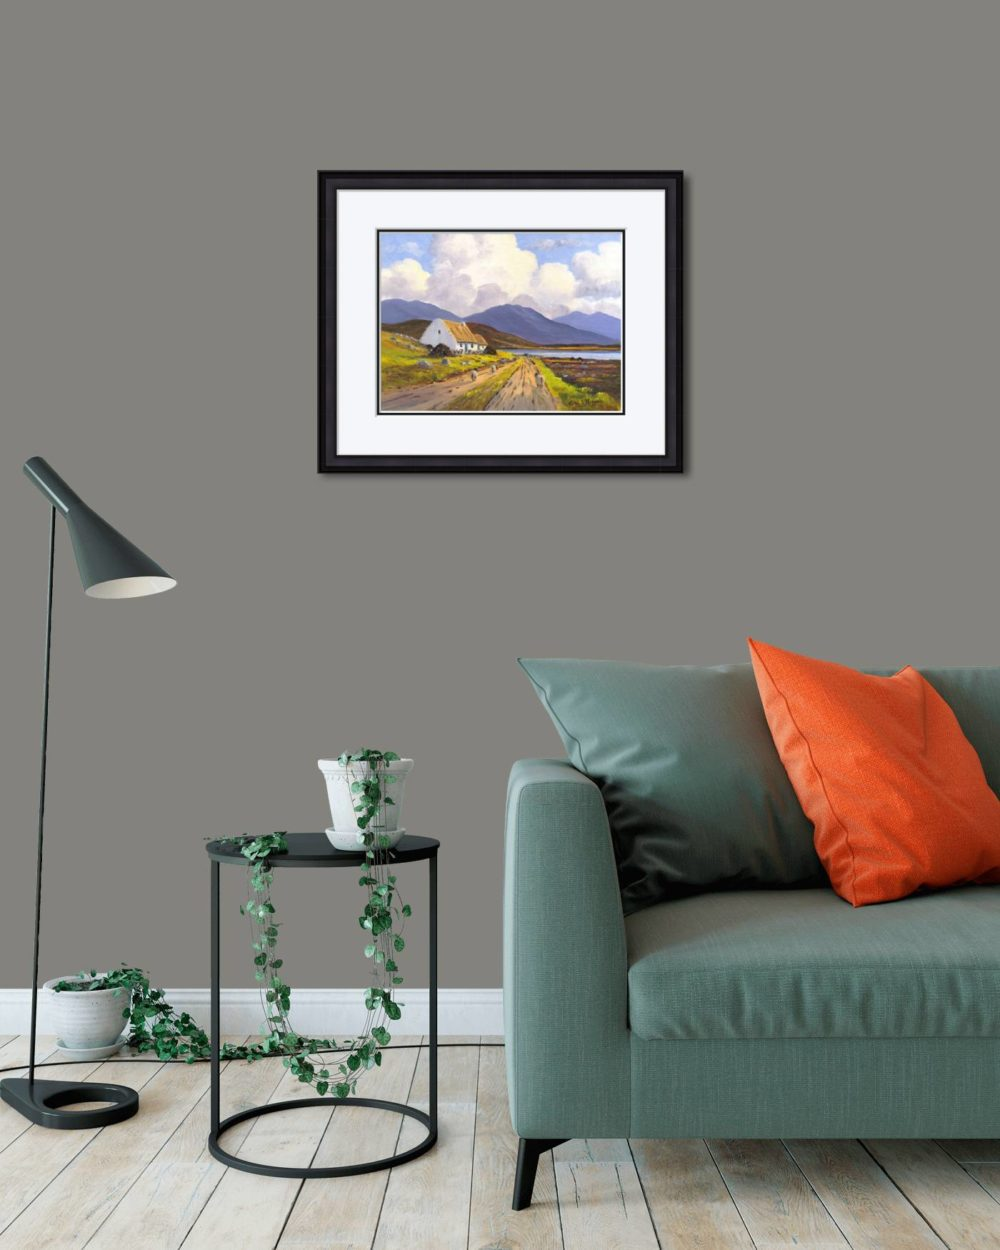 Connemara Cottage Print (Medium) in Black Frame in Room